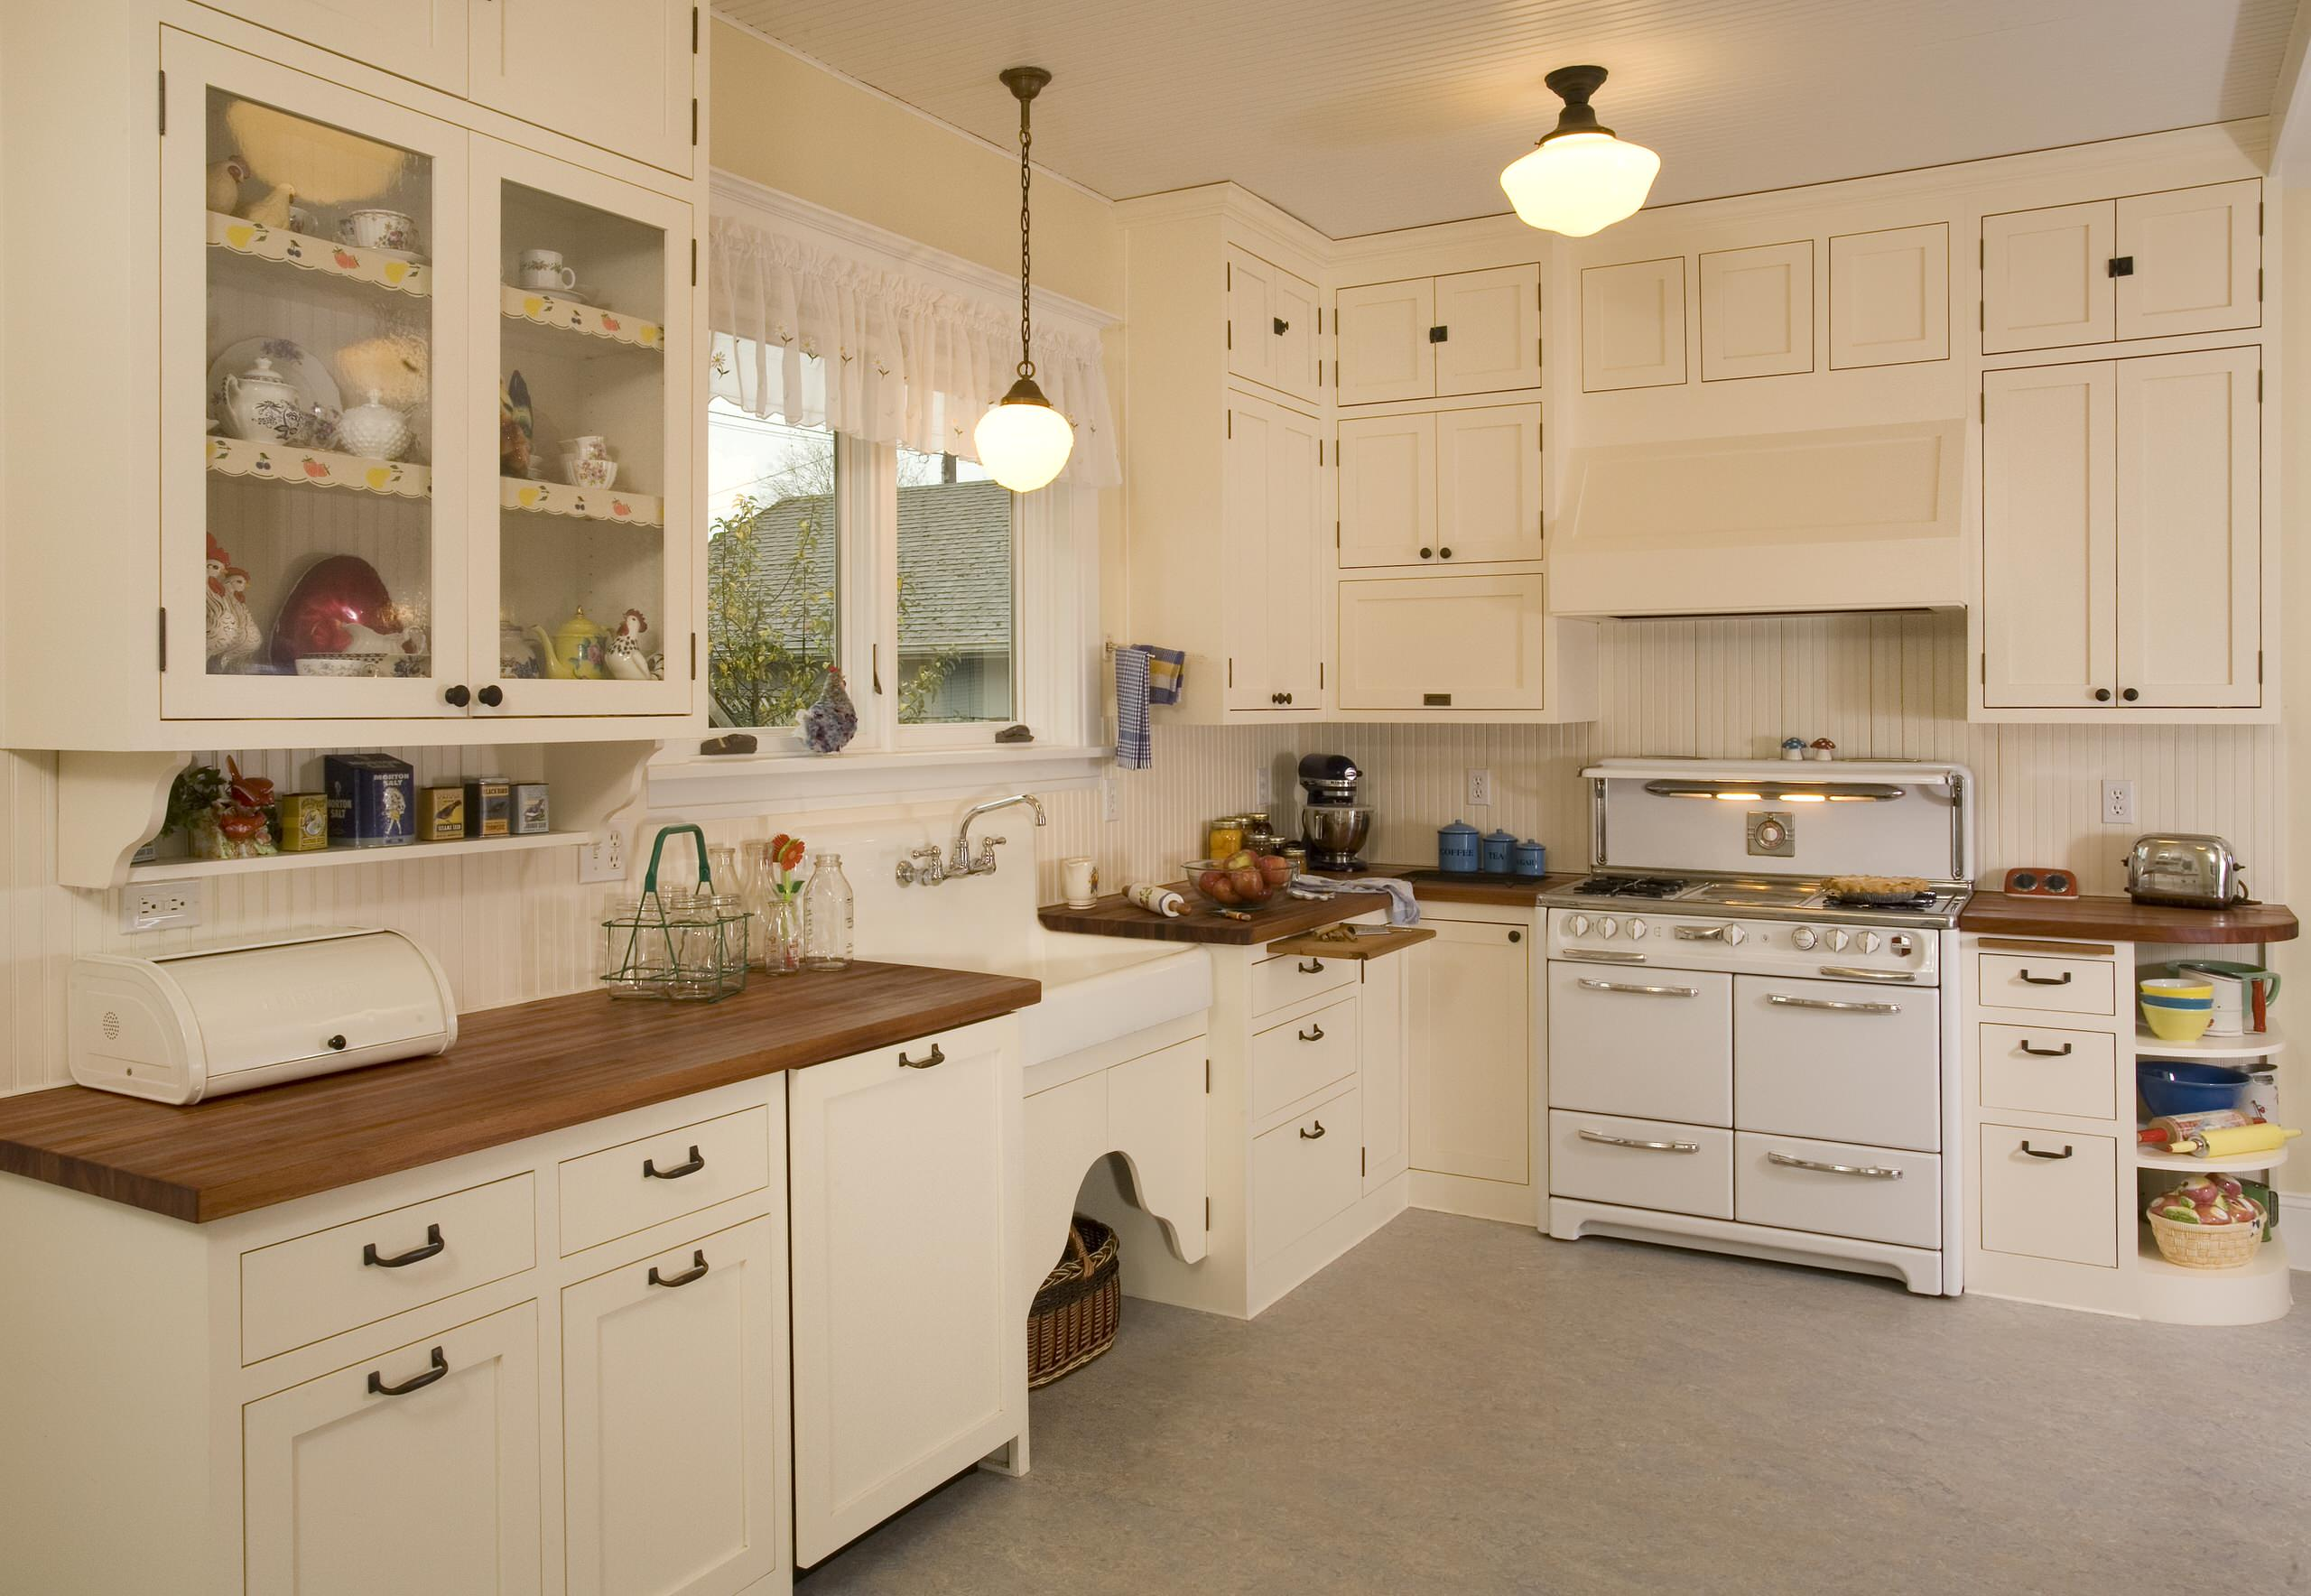 1920s Kitchen Ideas Photos Houzz